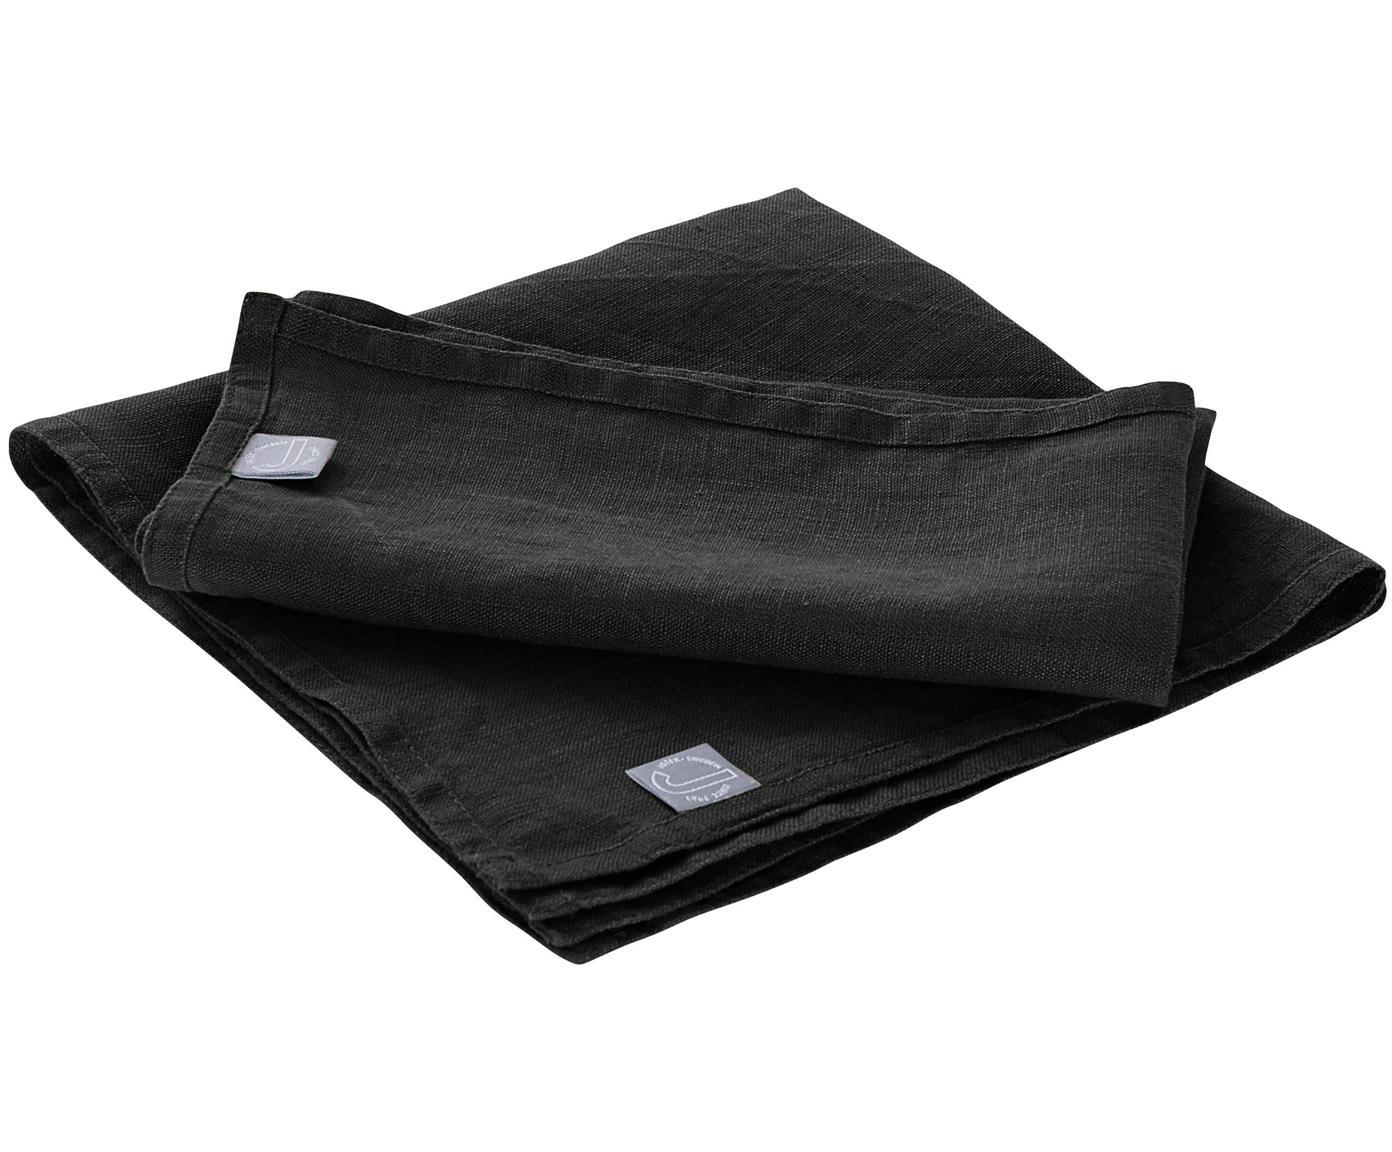 Servilletas de lino Hedda, 2uds., Lino, Negro, L 31 cm